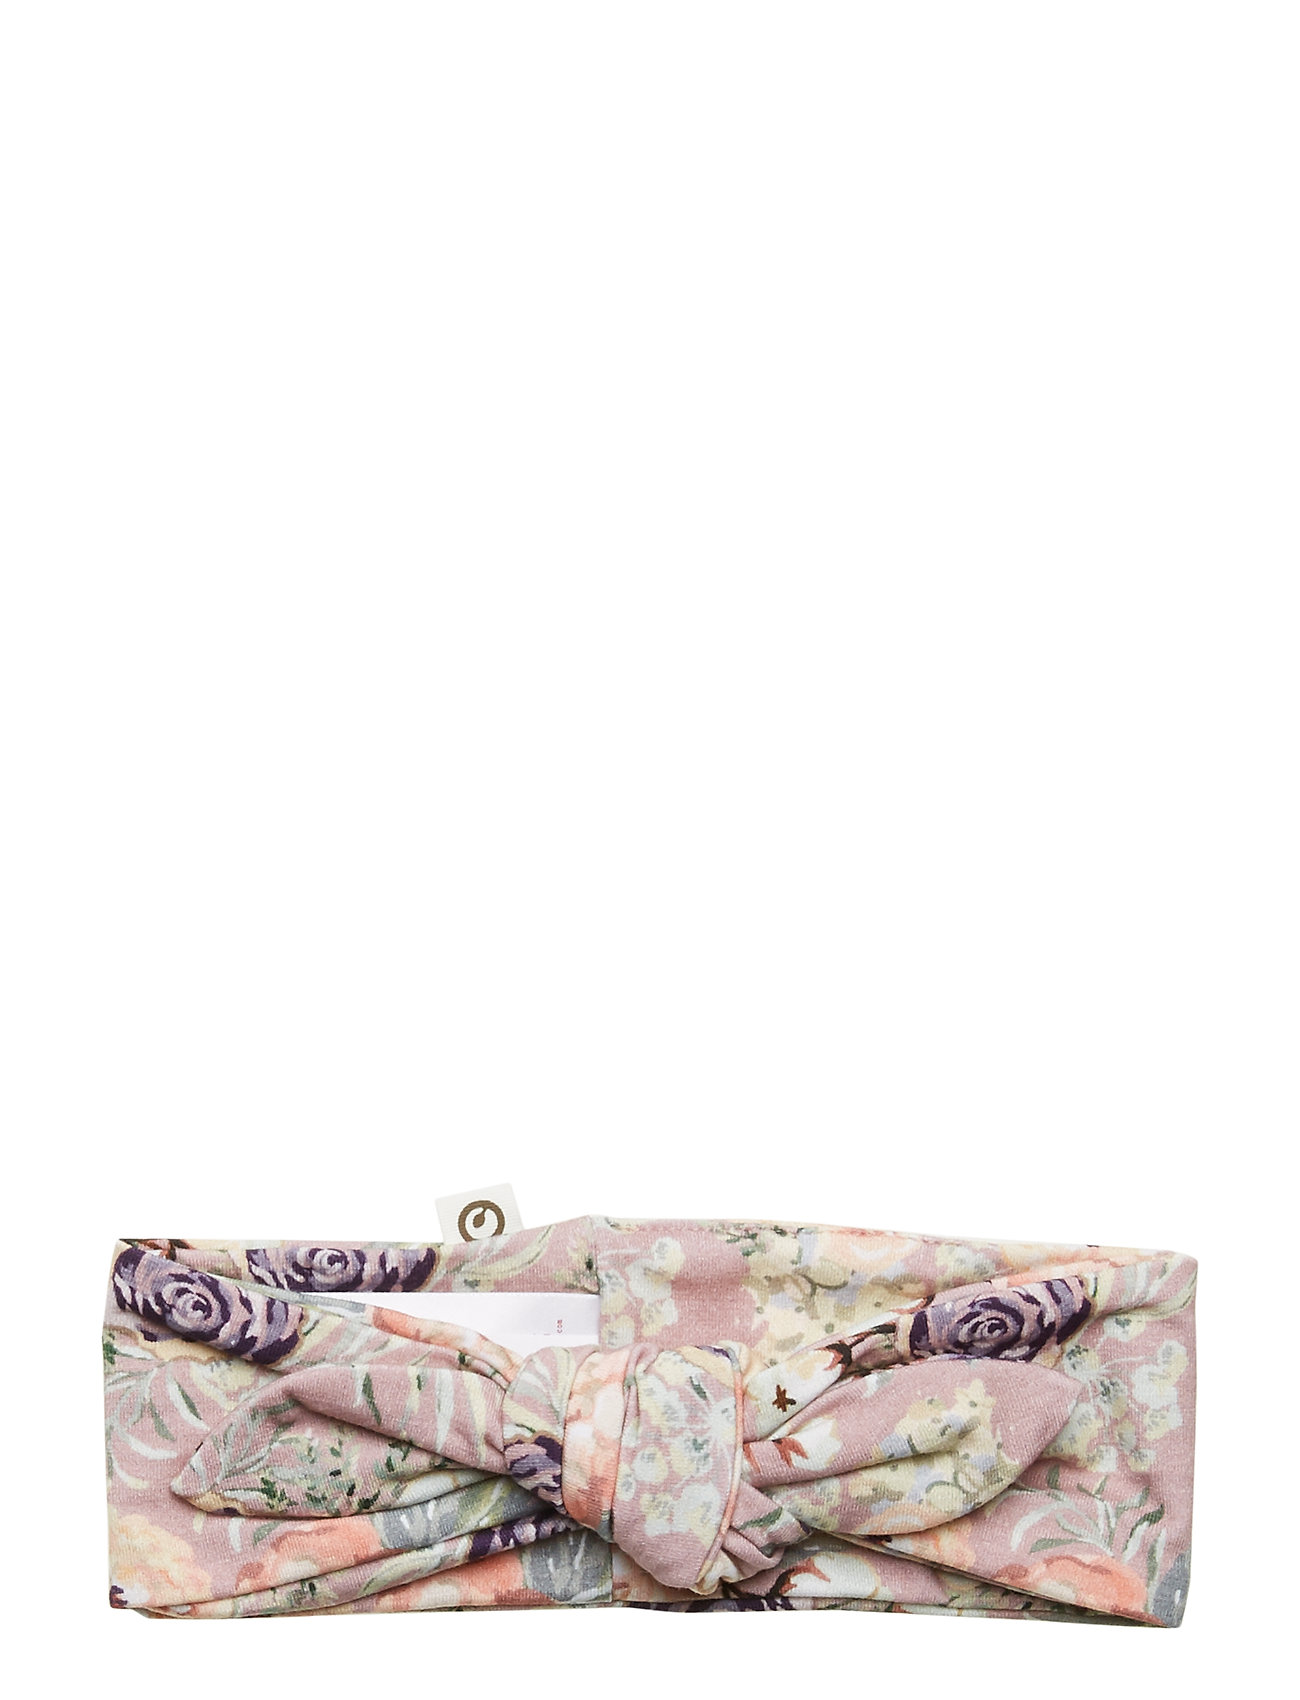 Müsli by Green Cotton Spicy bloom headband - ROSE